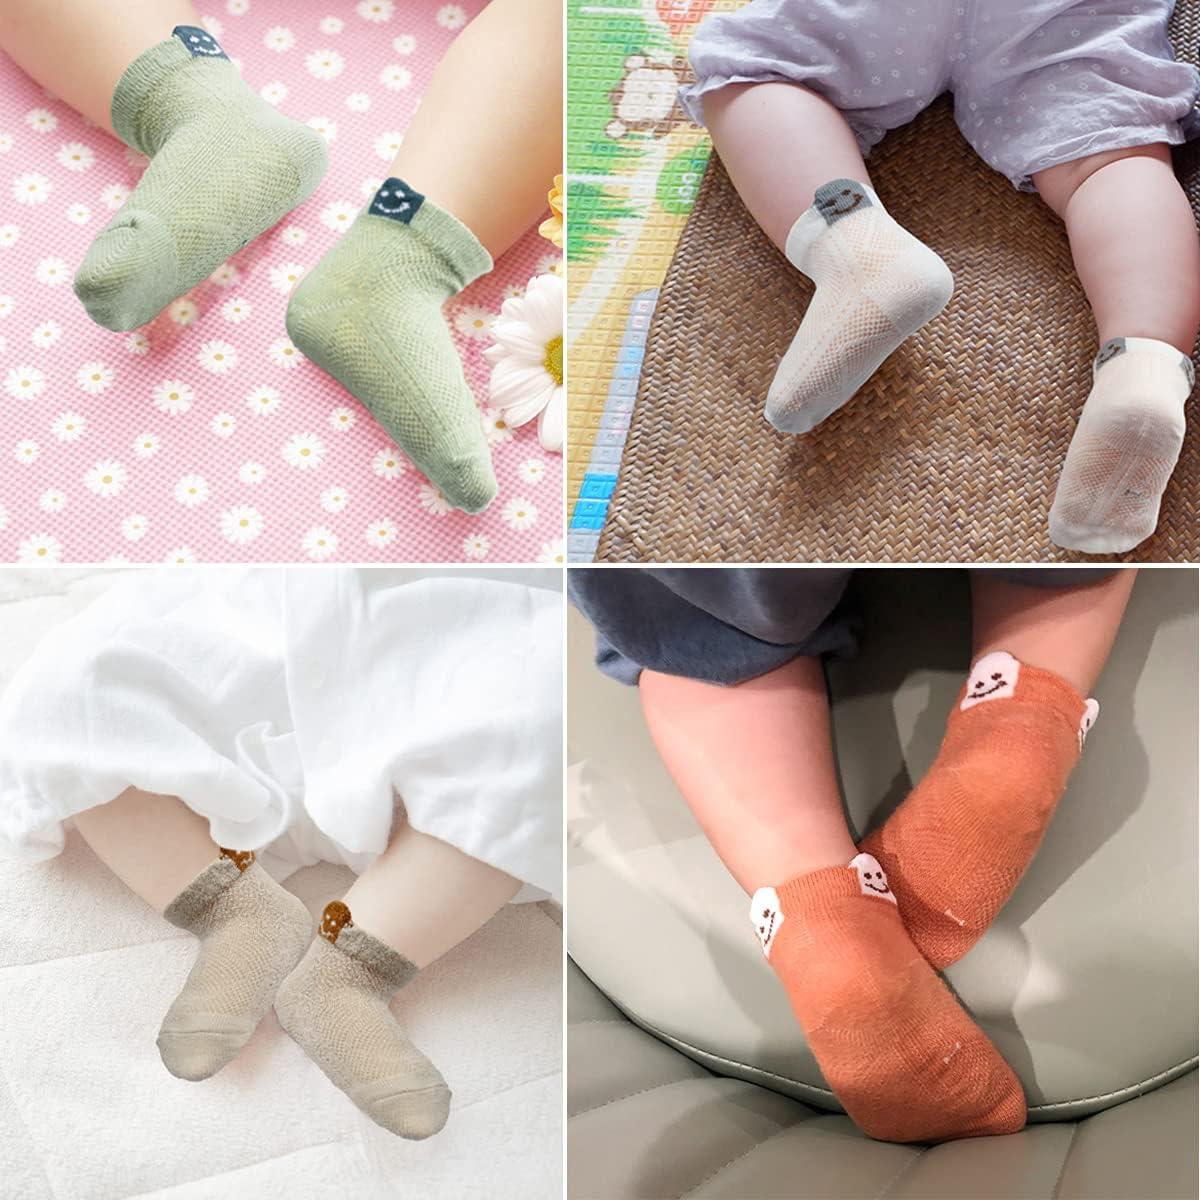 Toddler Socks 5 Pairs Non Slip Ankle Socks for Newborn Baby Girls Boys Infant 0-12 Months/1T-3T/3T-5T Years Old Kids